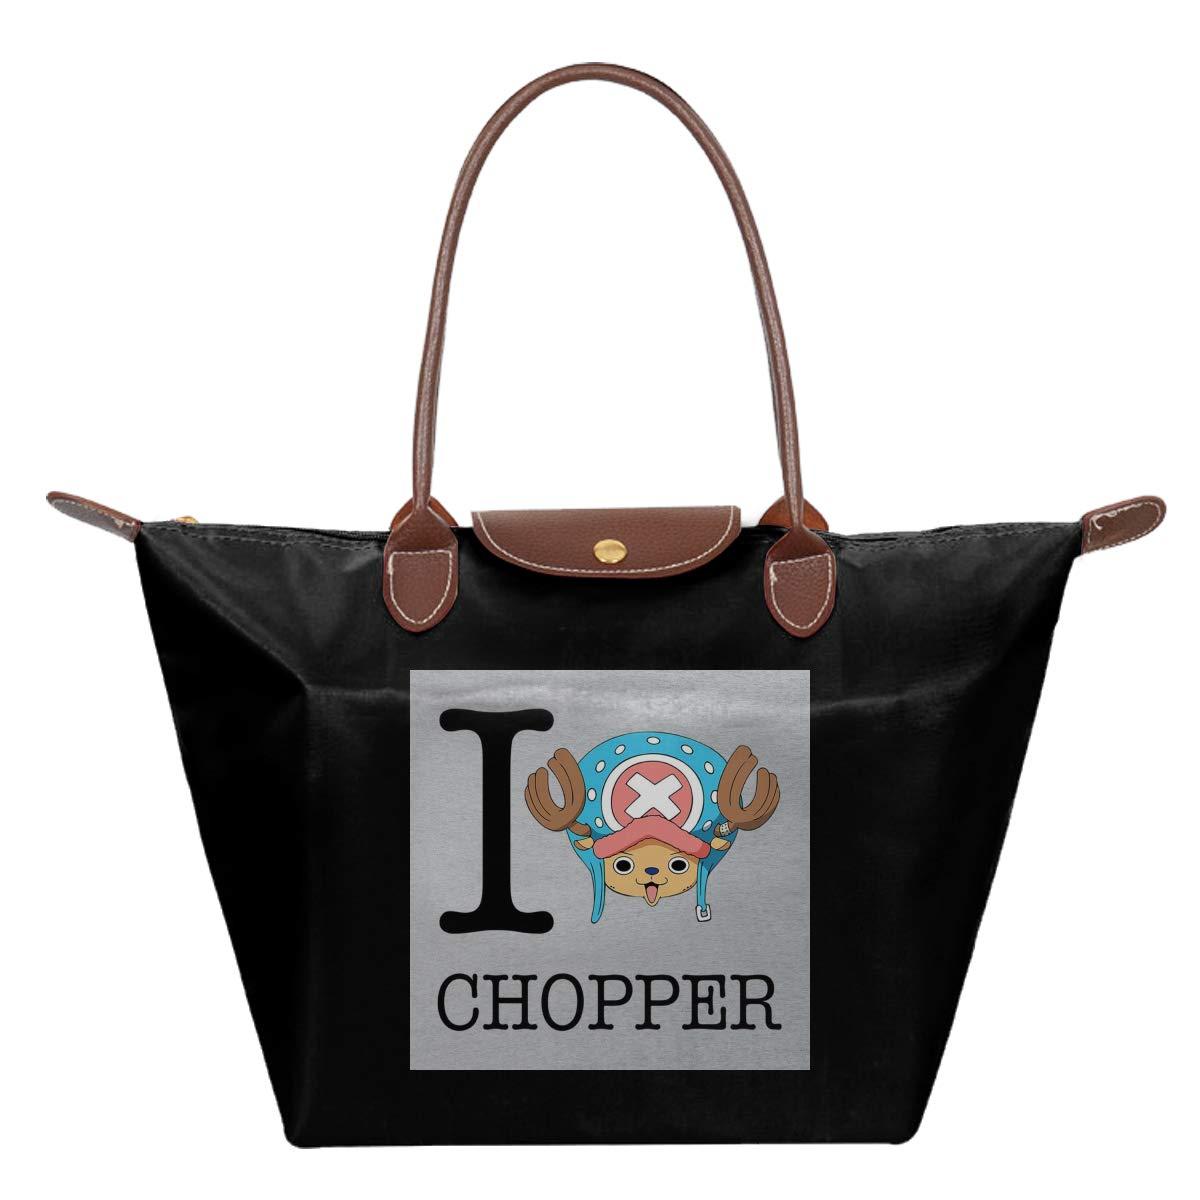 I Heart Tony Tony Chopper One Piece Waterproof Leather Folded Messenger Nylon Bag Travel Tote Hopping Folding School Handbags